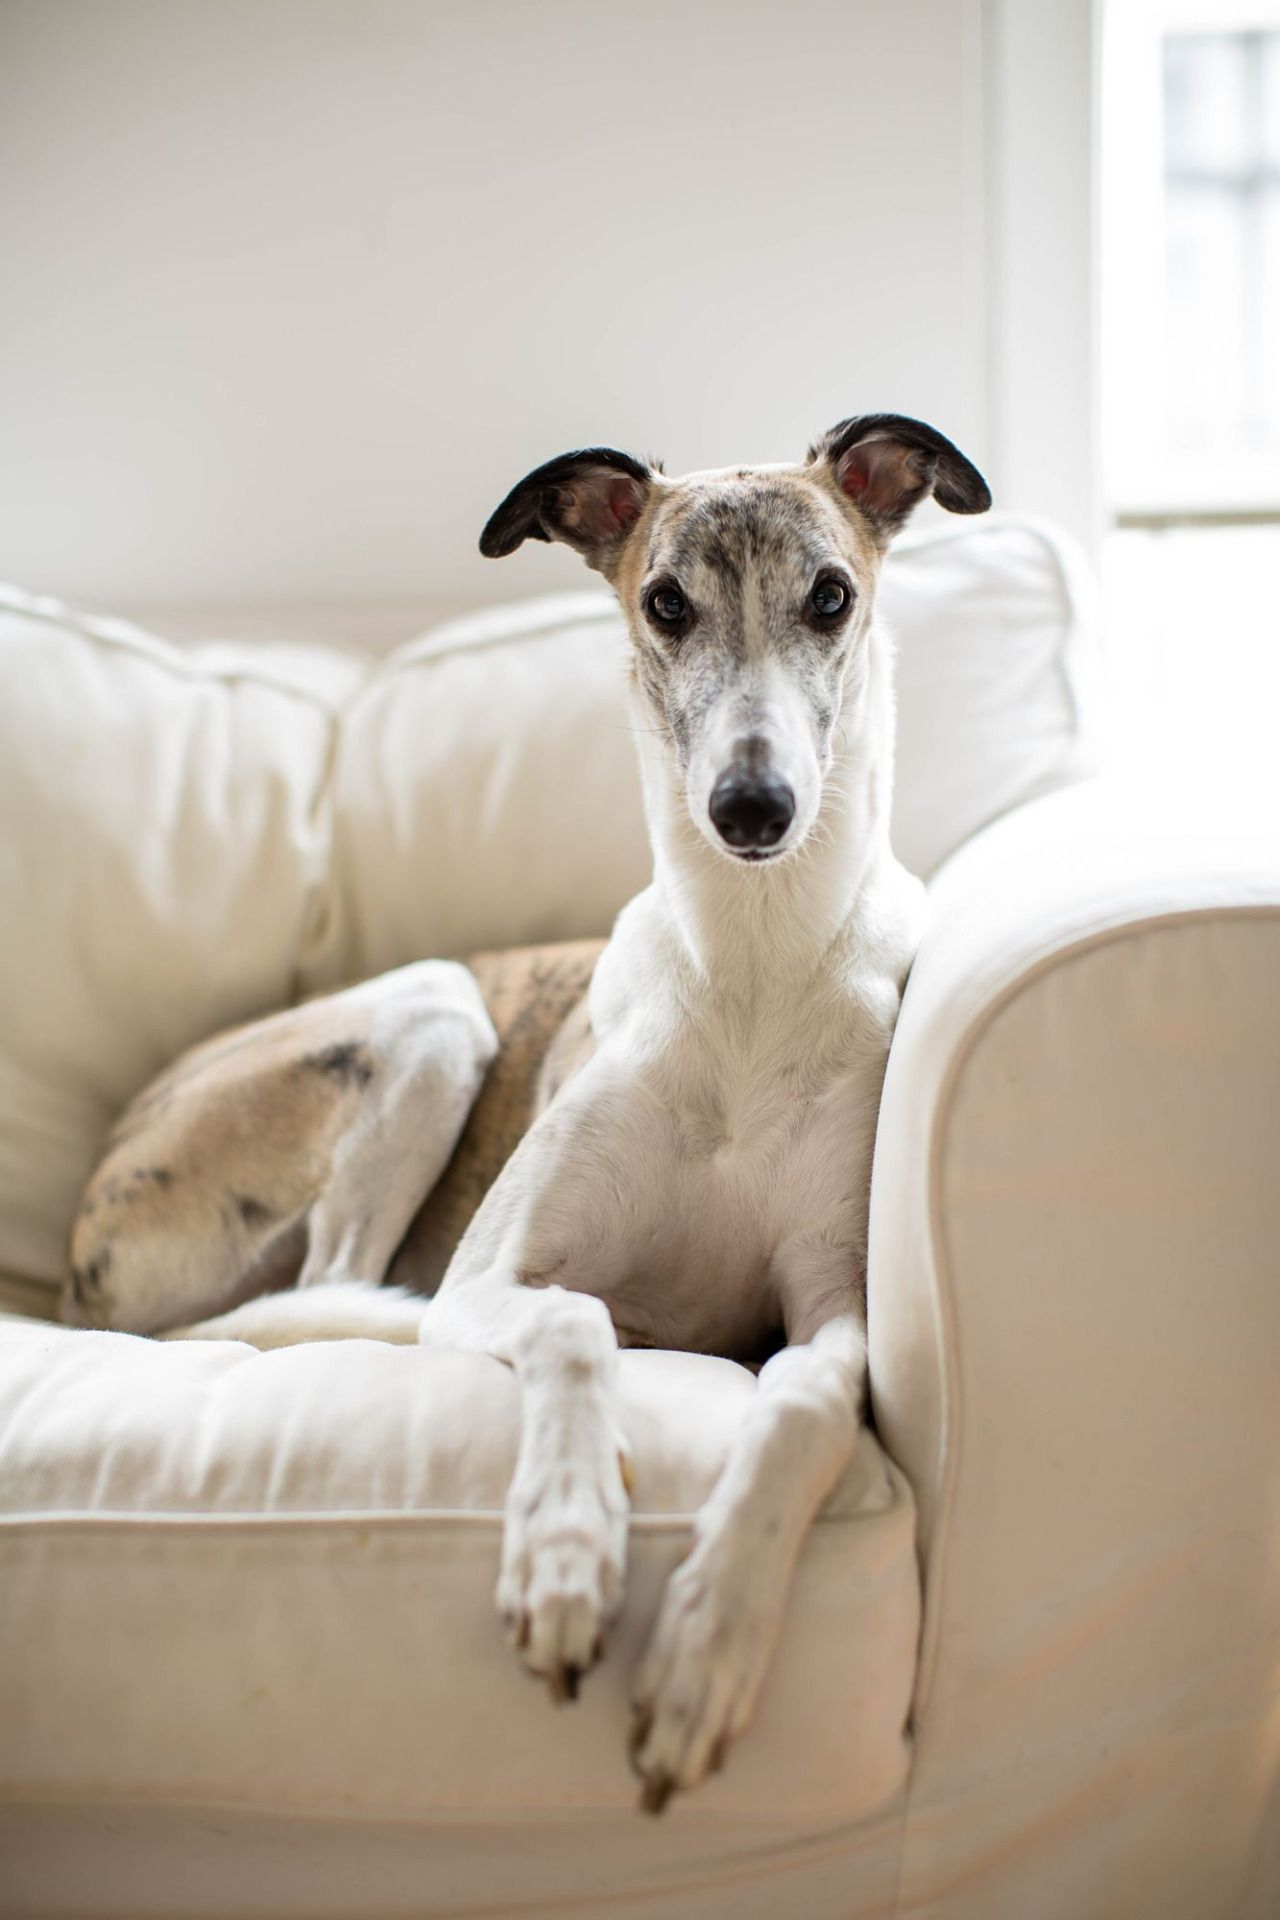 Handsomedogs Jarkko Heinonen A Whippet Boy Jymy Sitting On A Chair In Our Berlin Apartment Windhund Welpen Hunde Whippet Hund